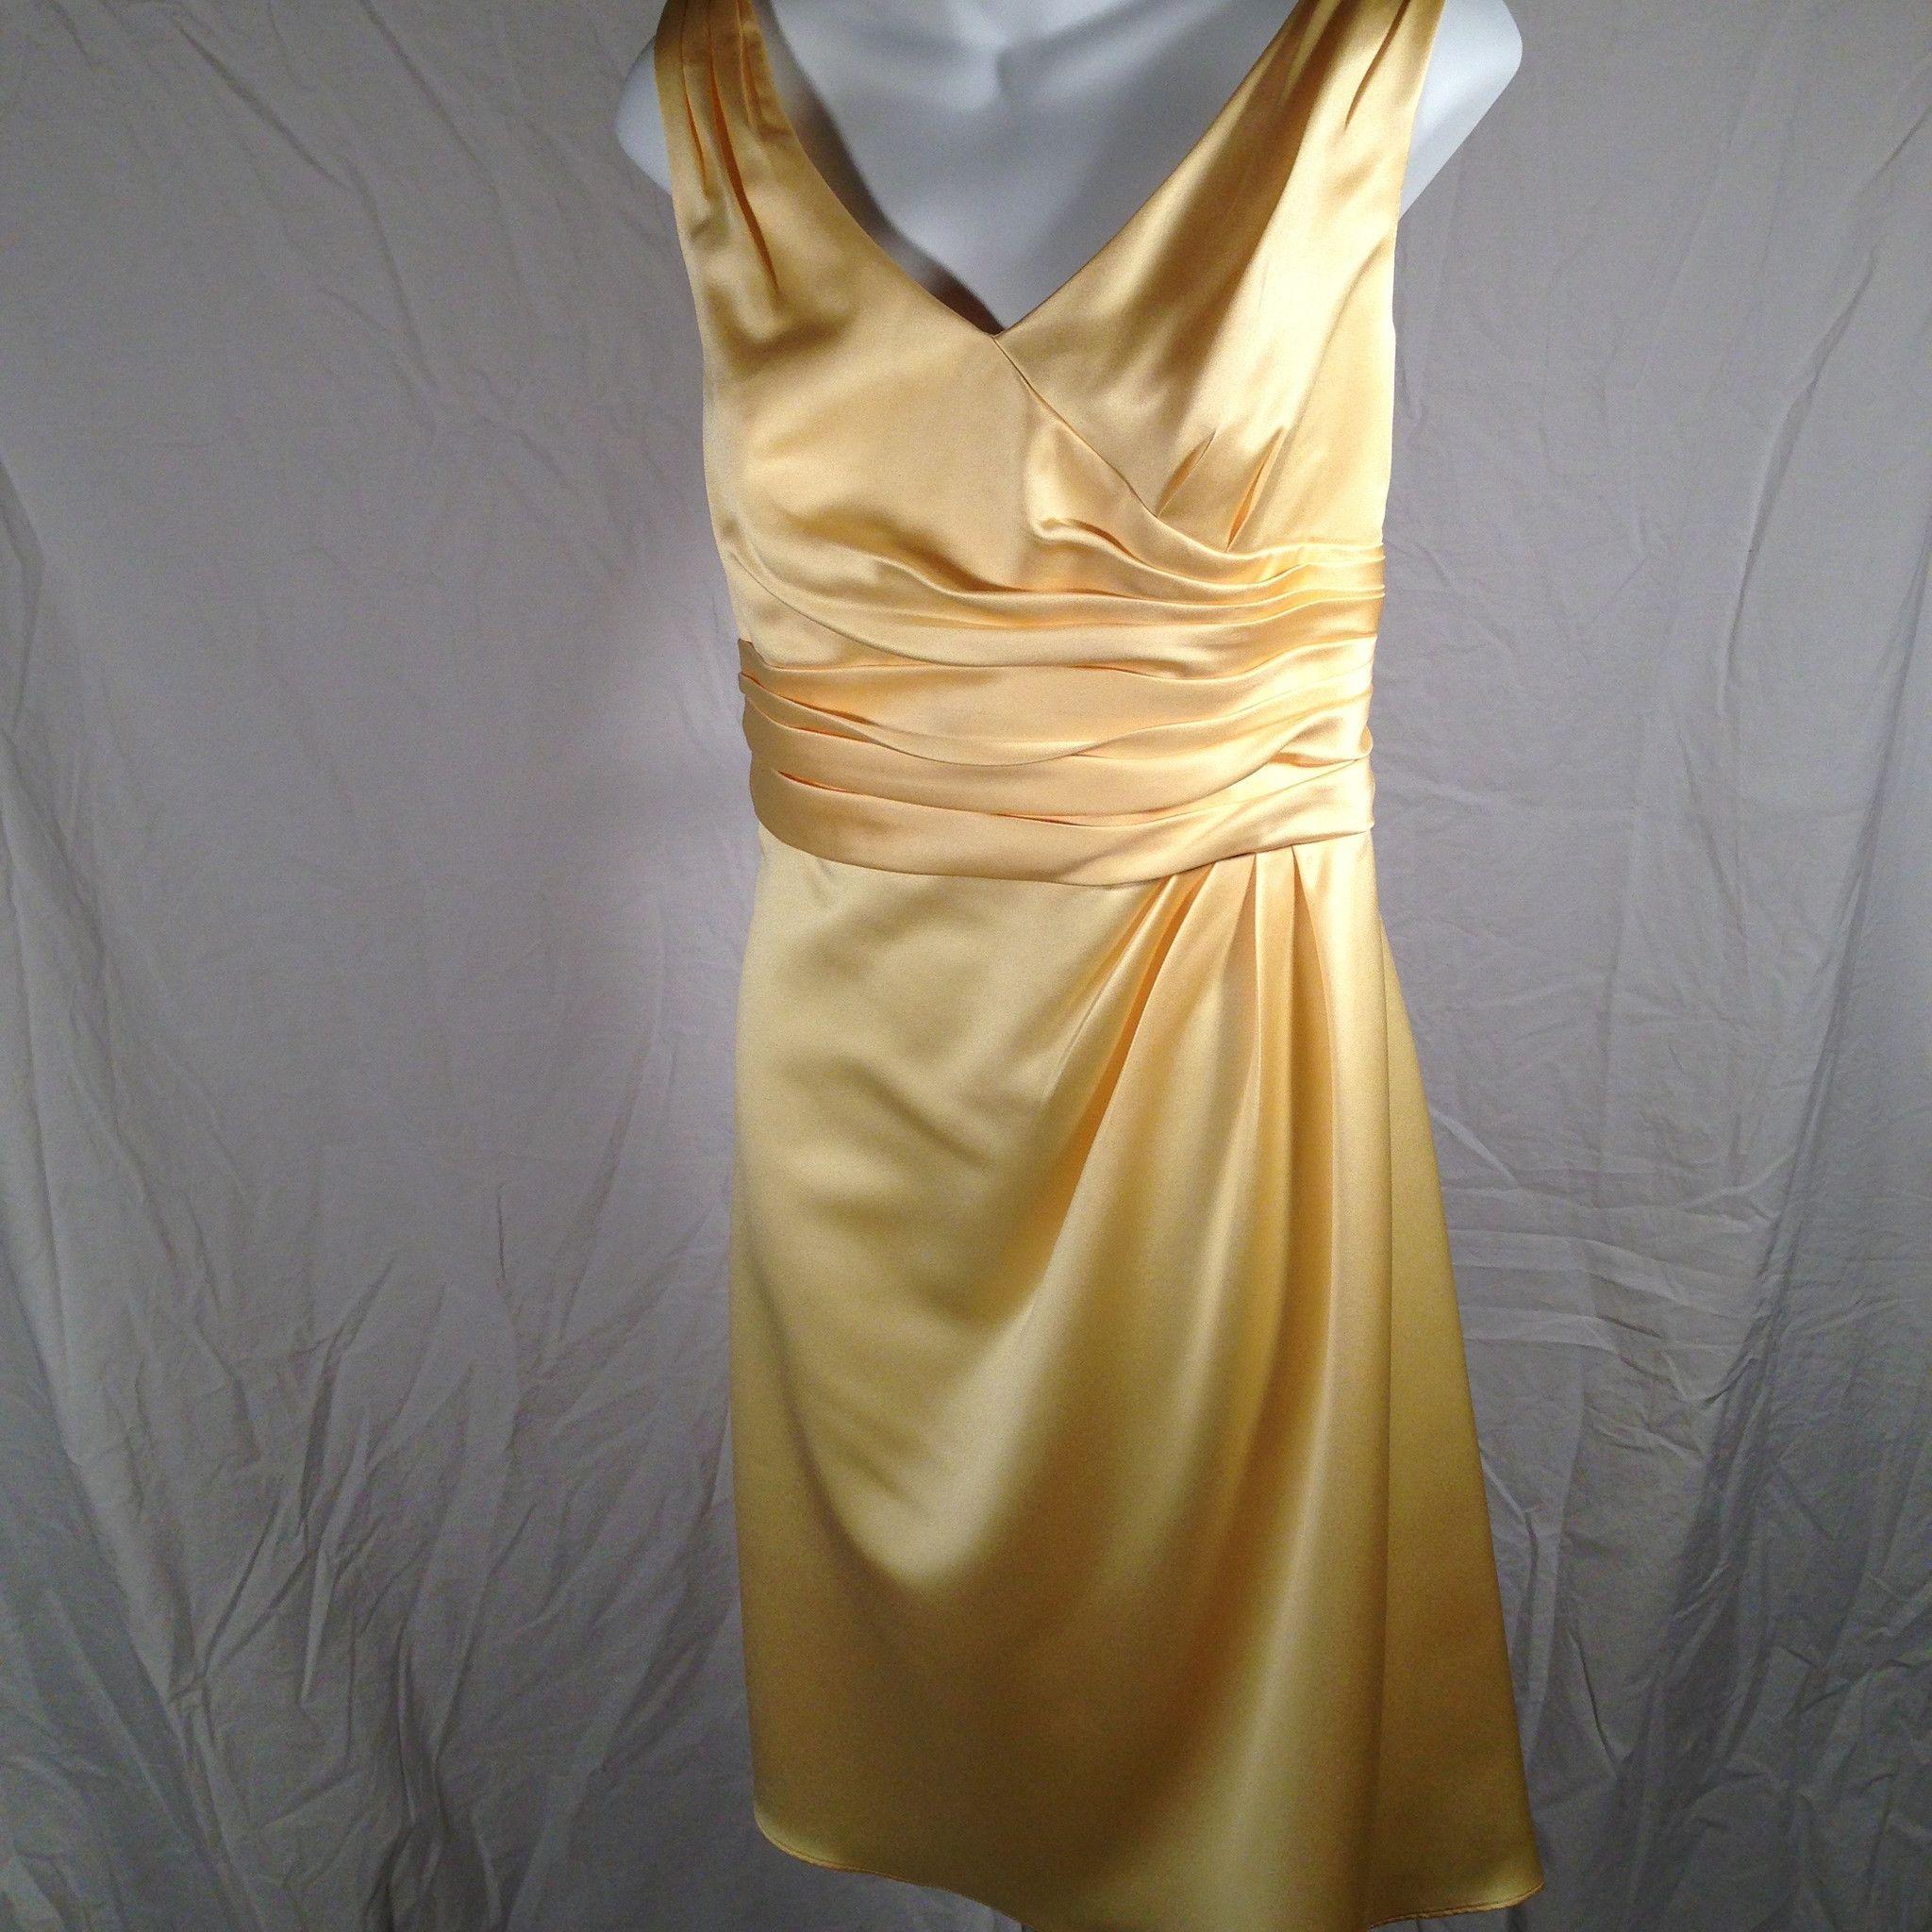 Yellow dress to wedding  Davidus Bridal Bridesmaid Sleeveless Yellow Dress Size   Weddings